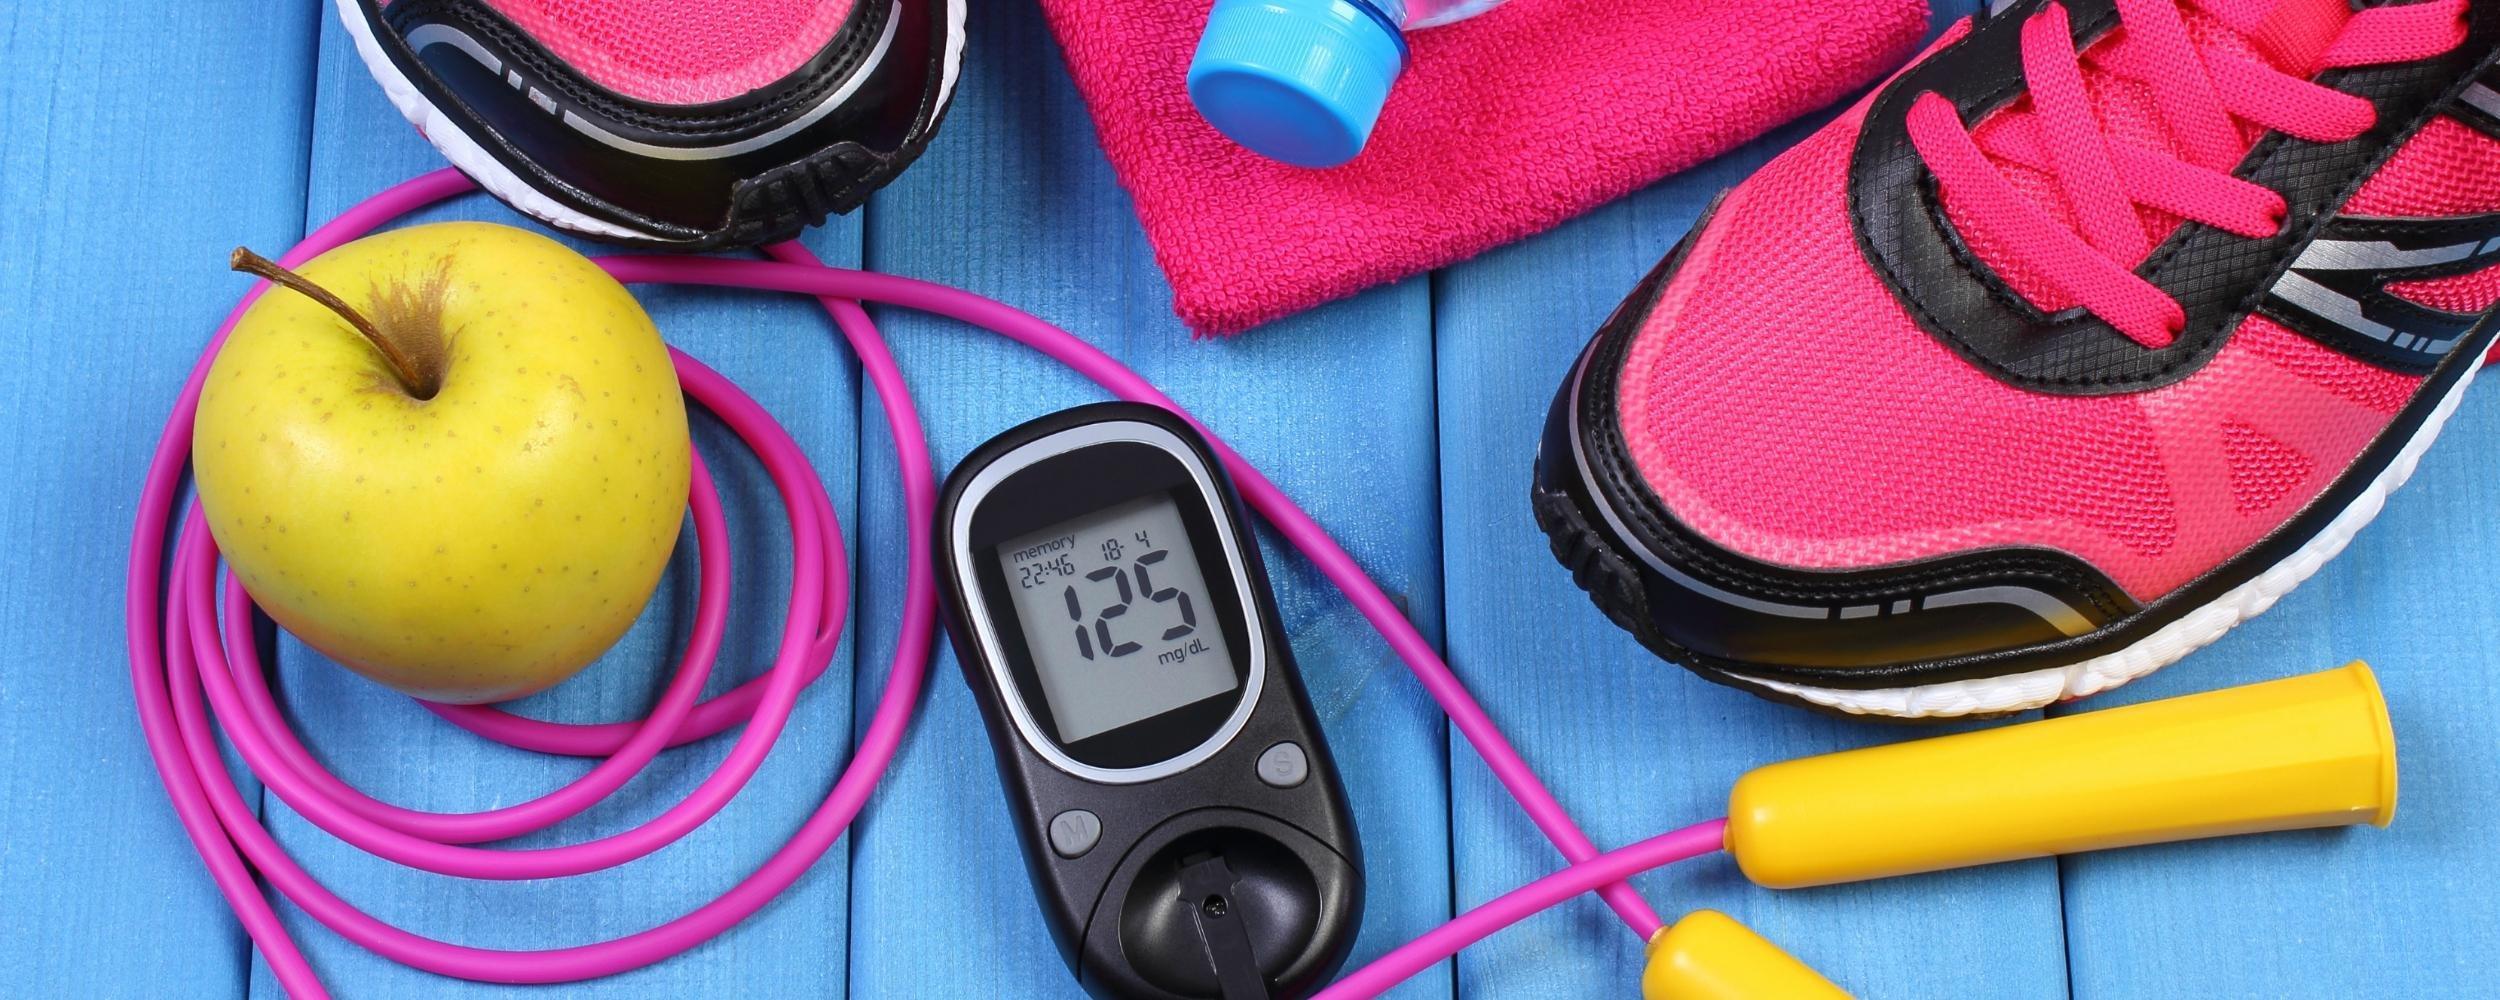 Evaluation Of The Ymca Diabetes Prevention Program